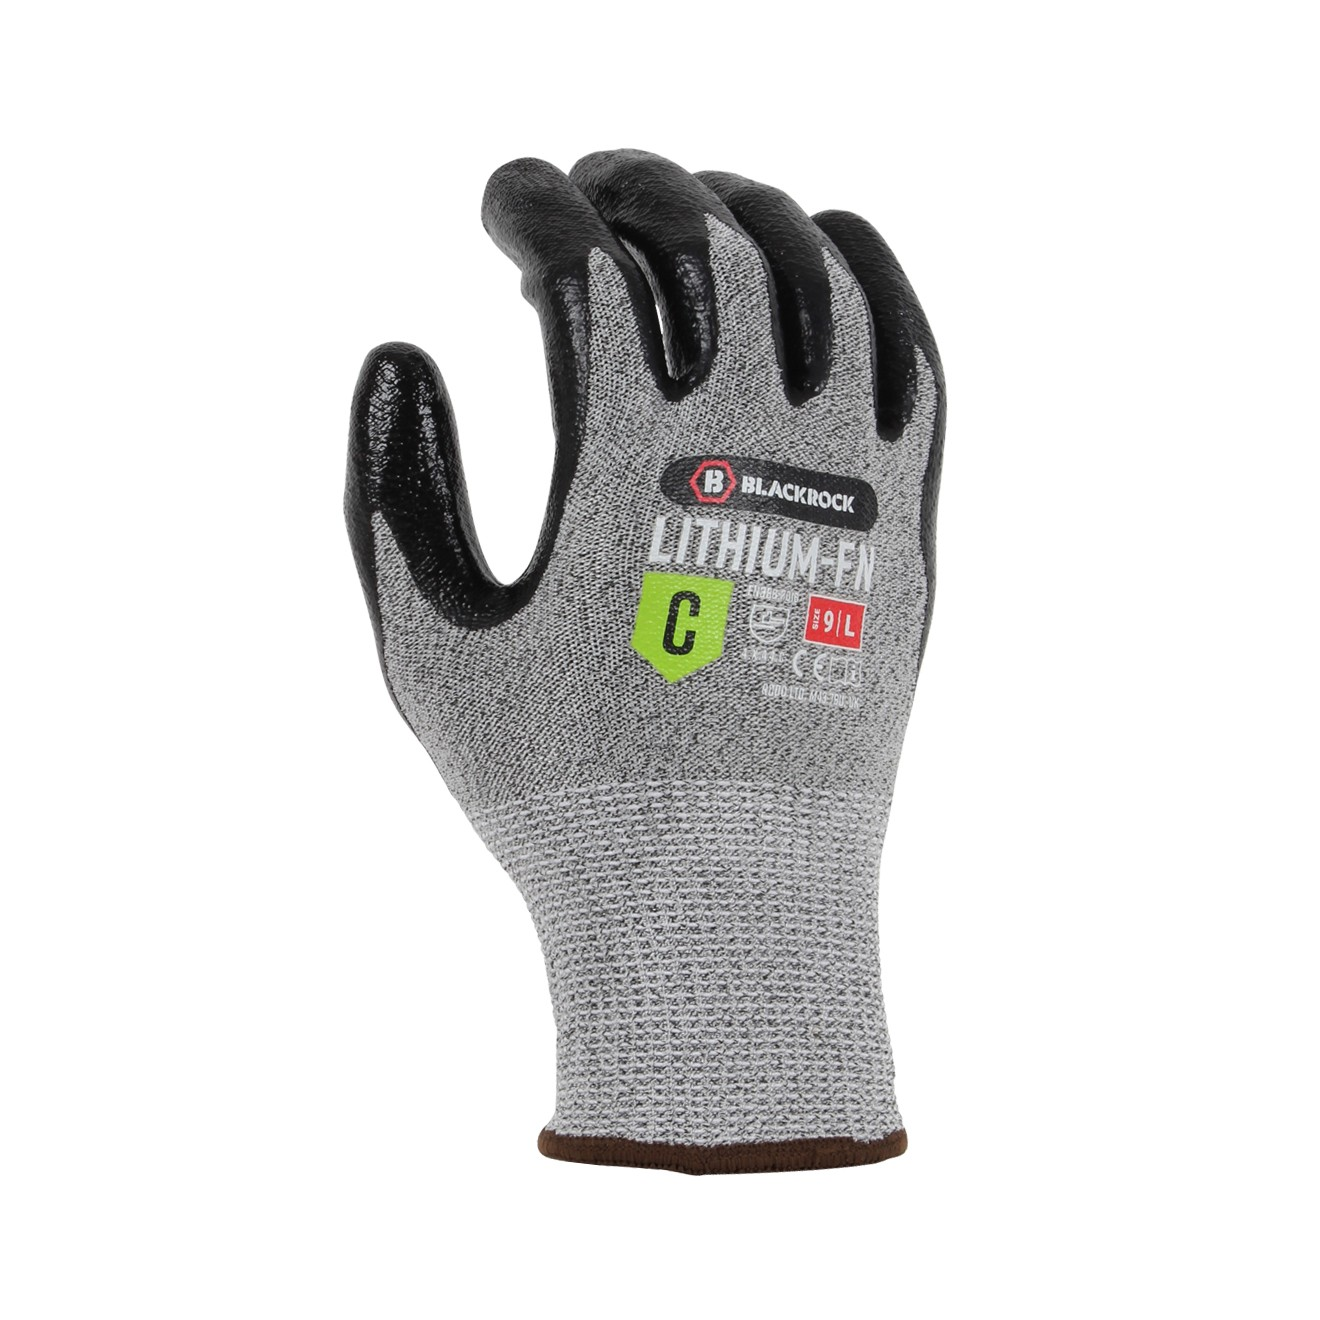 Lithium-FN Cut Resistant Glove